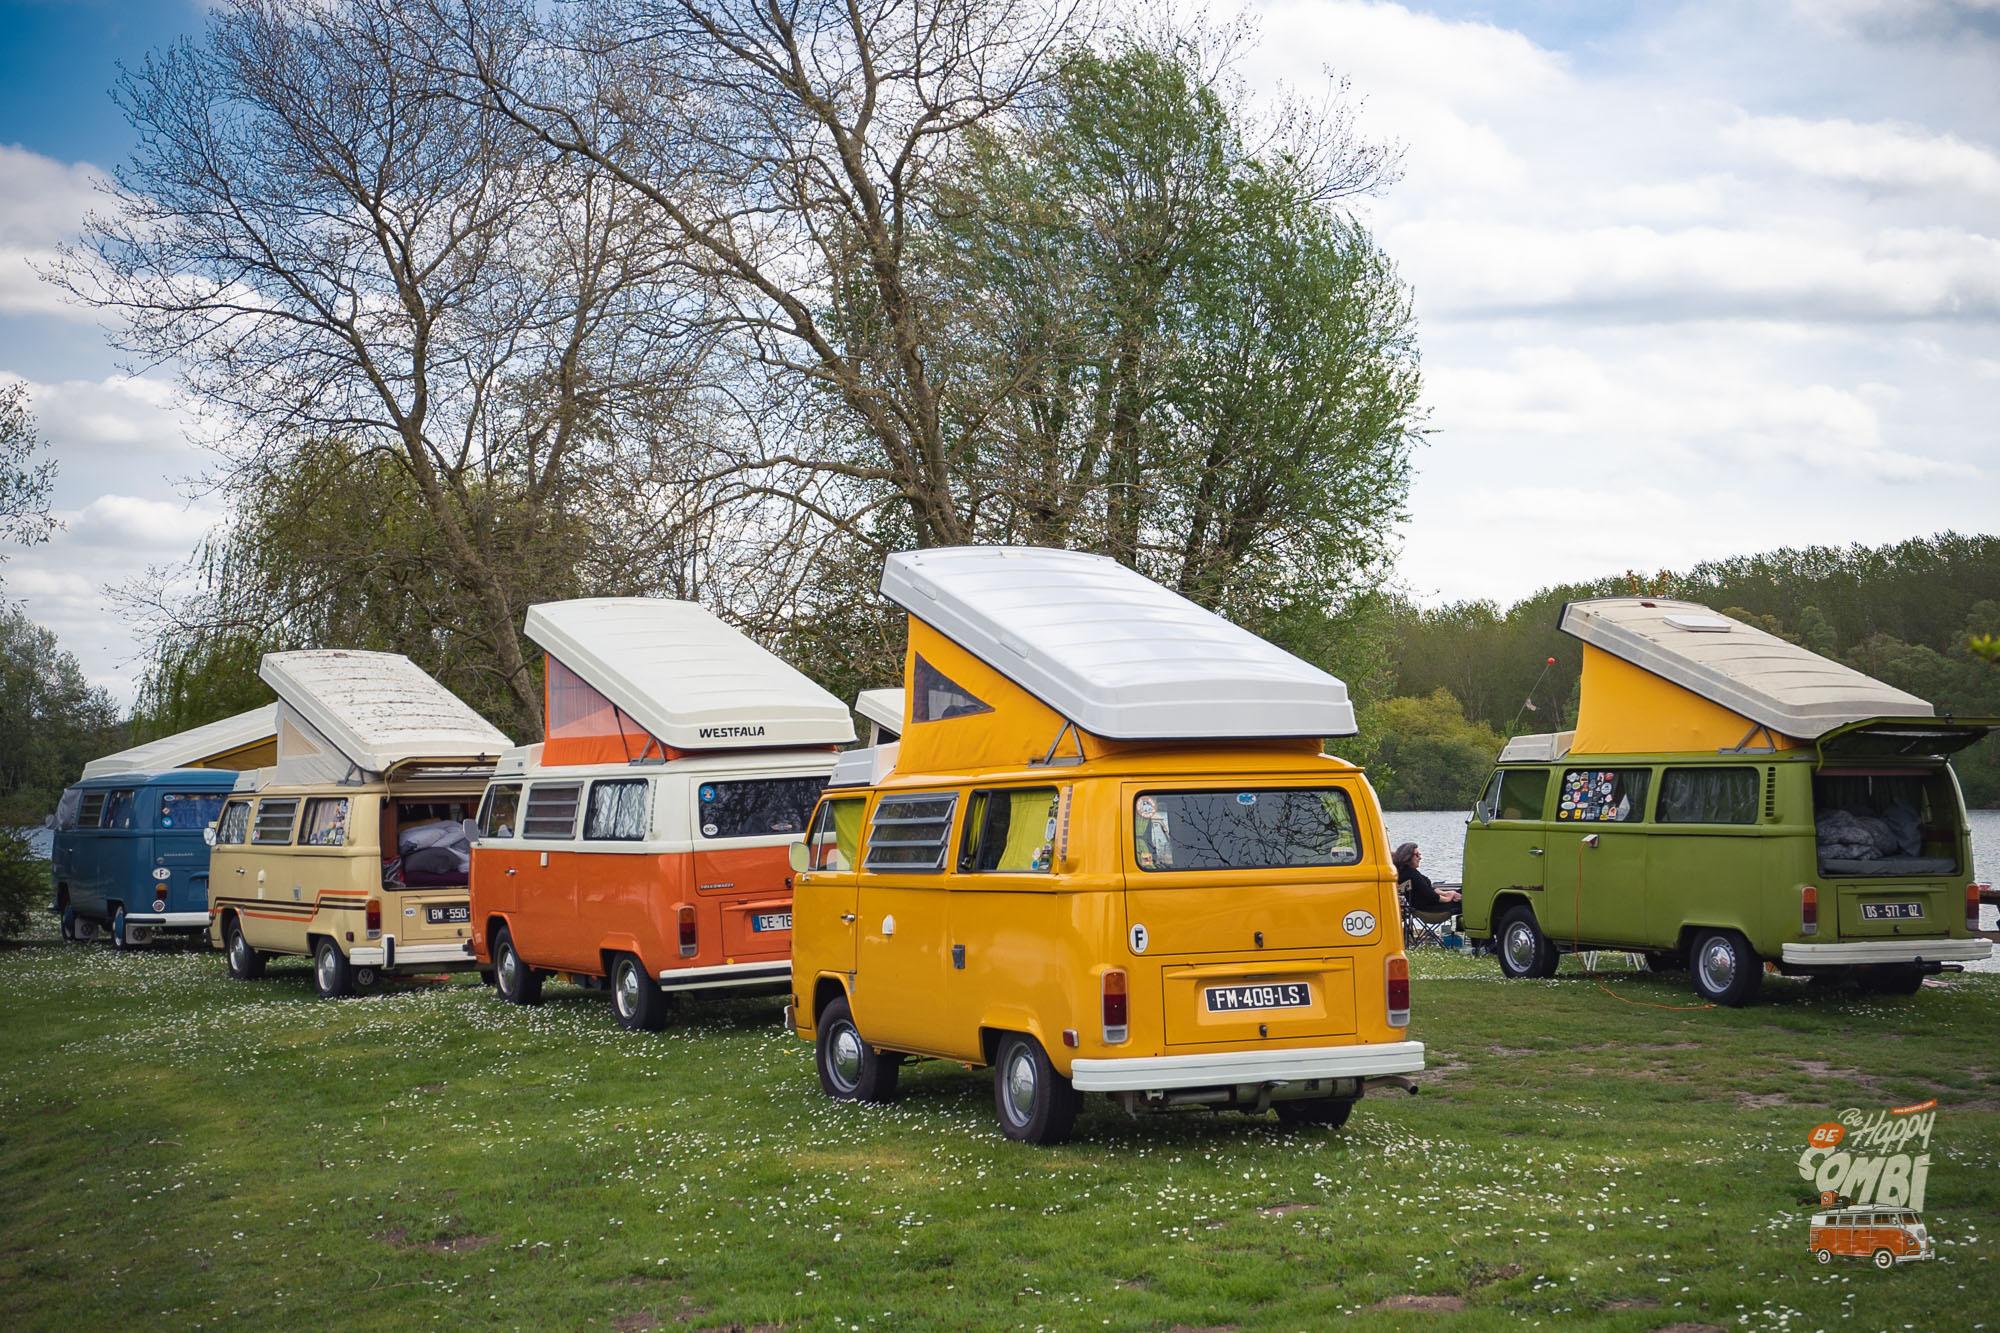 Les retrouvailles de Band of Campers (BOC) - BeCombi